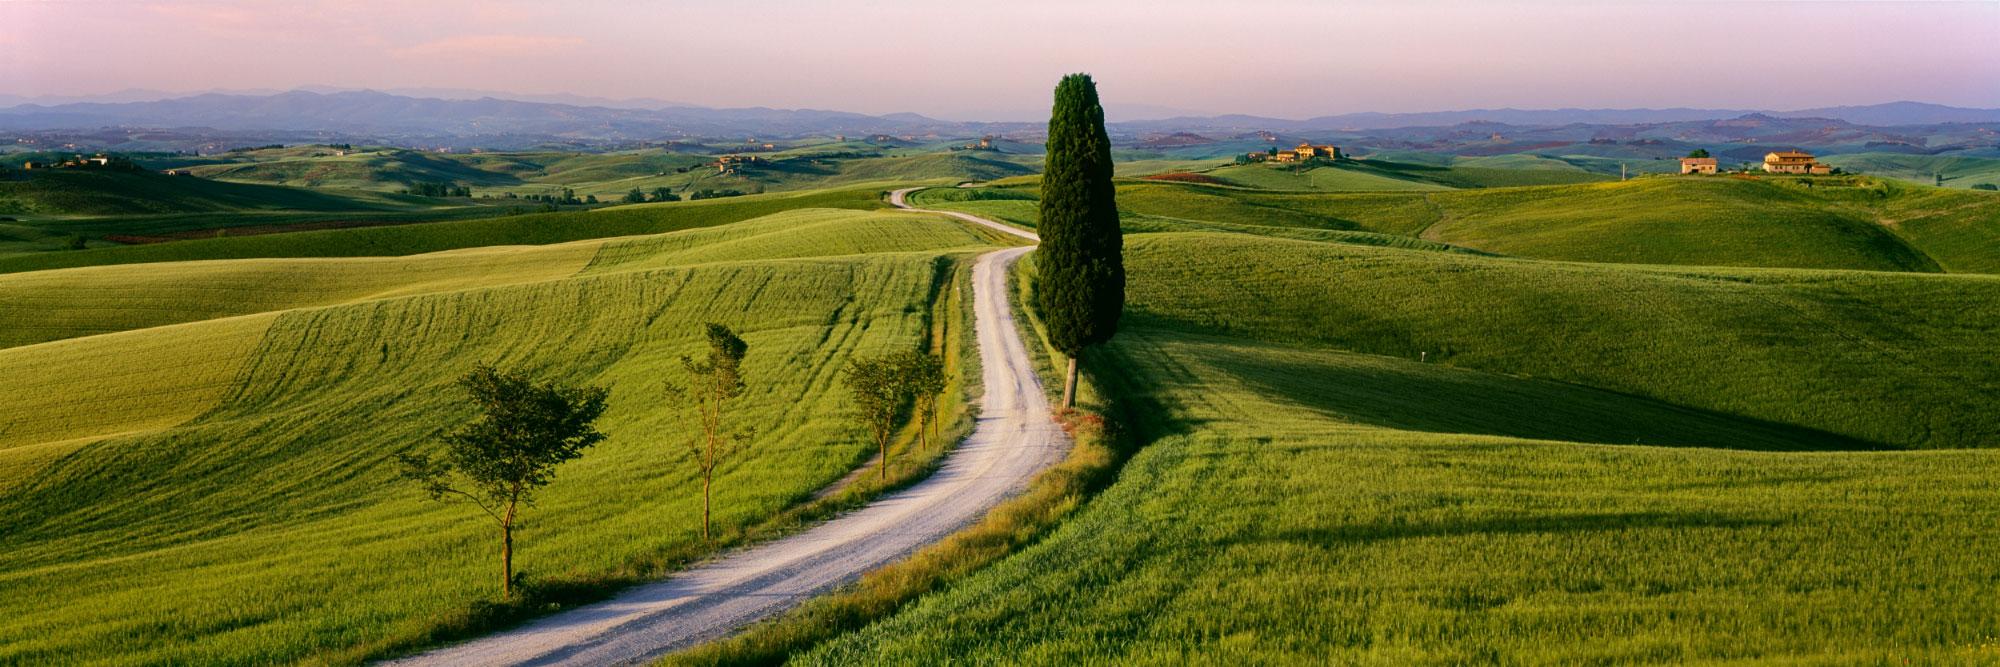 8483-voyage-italie-Chemin-de-terre-et-villas-Corsano-panorama-sentucq.h